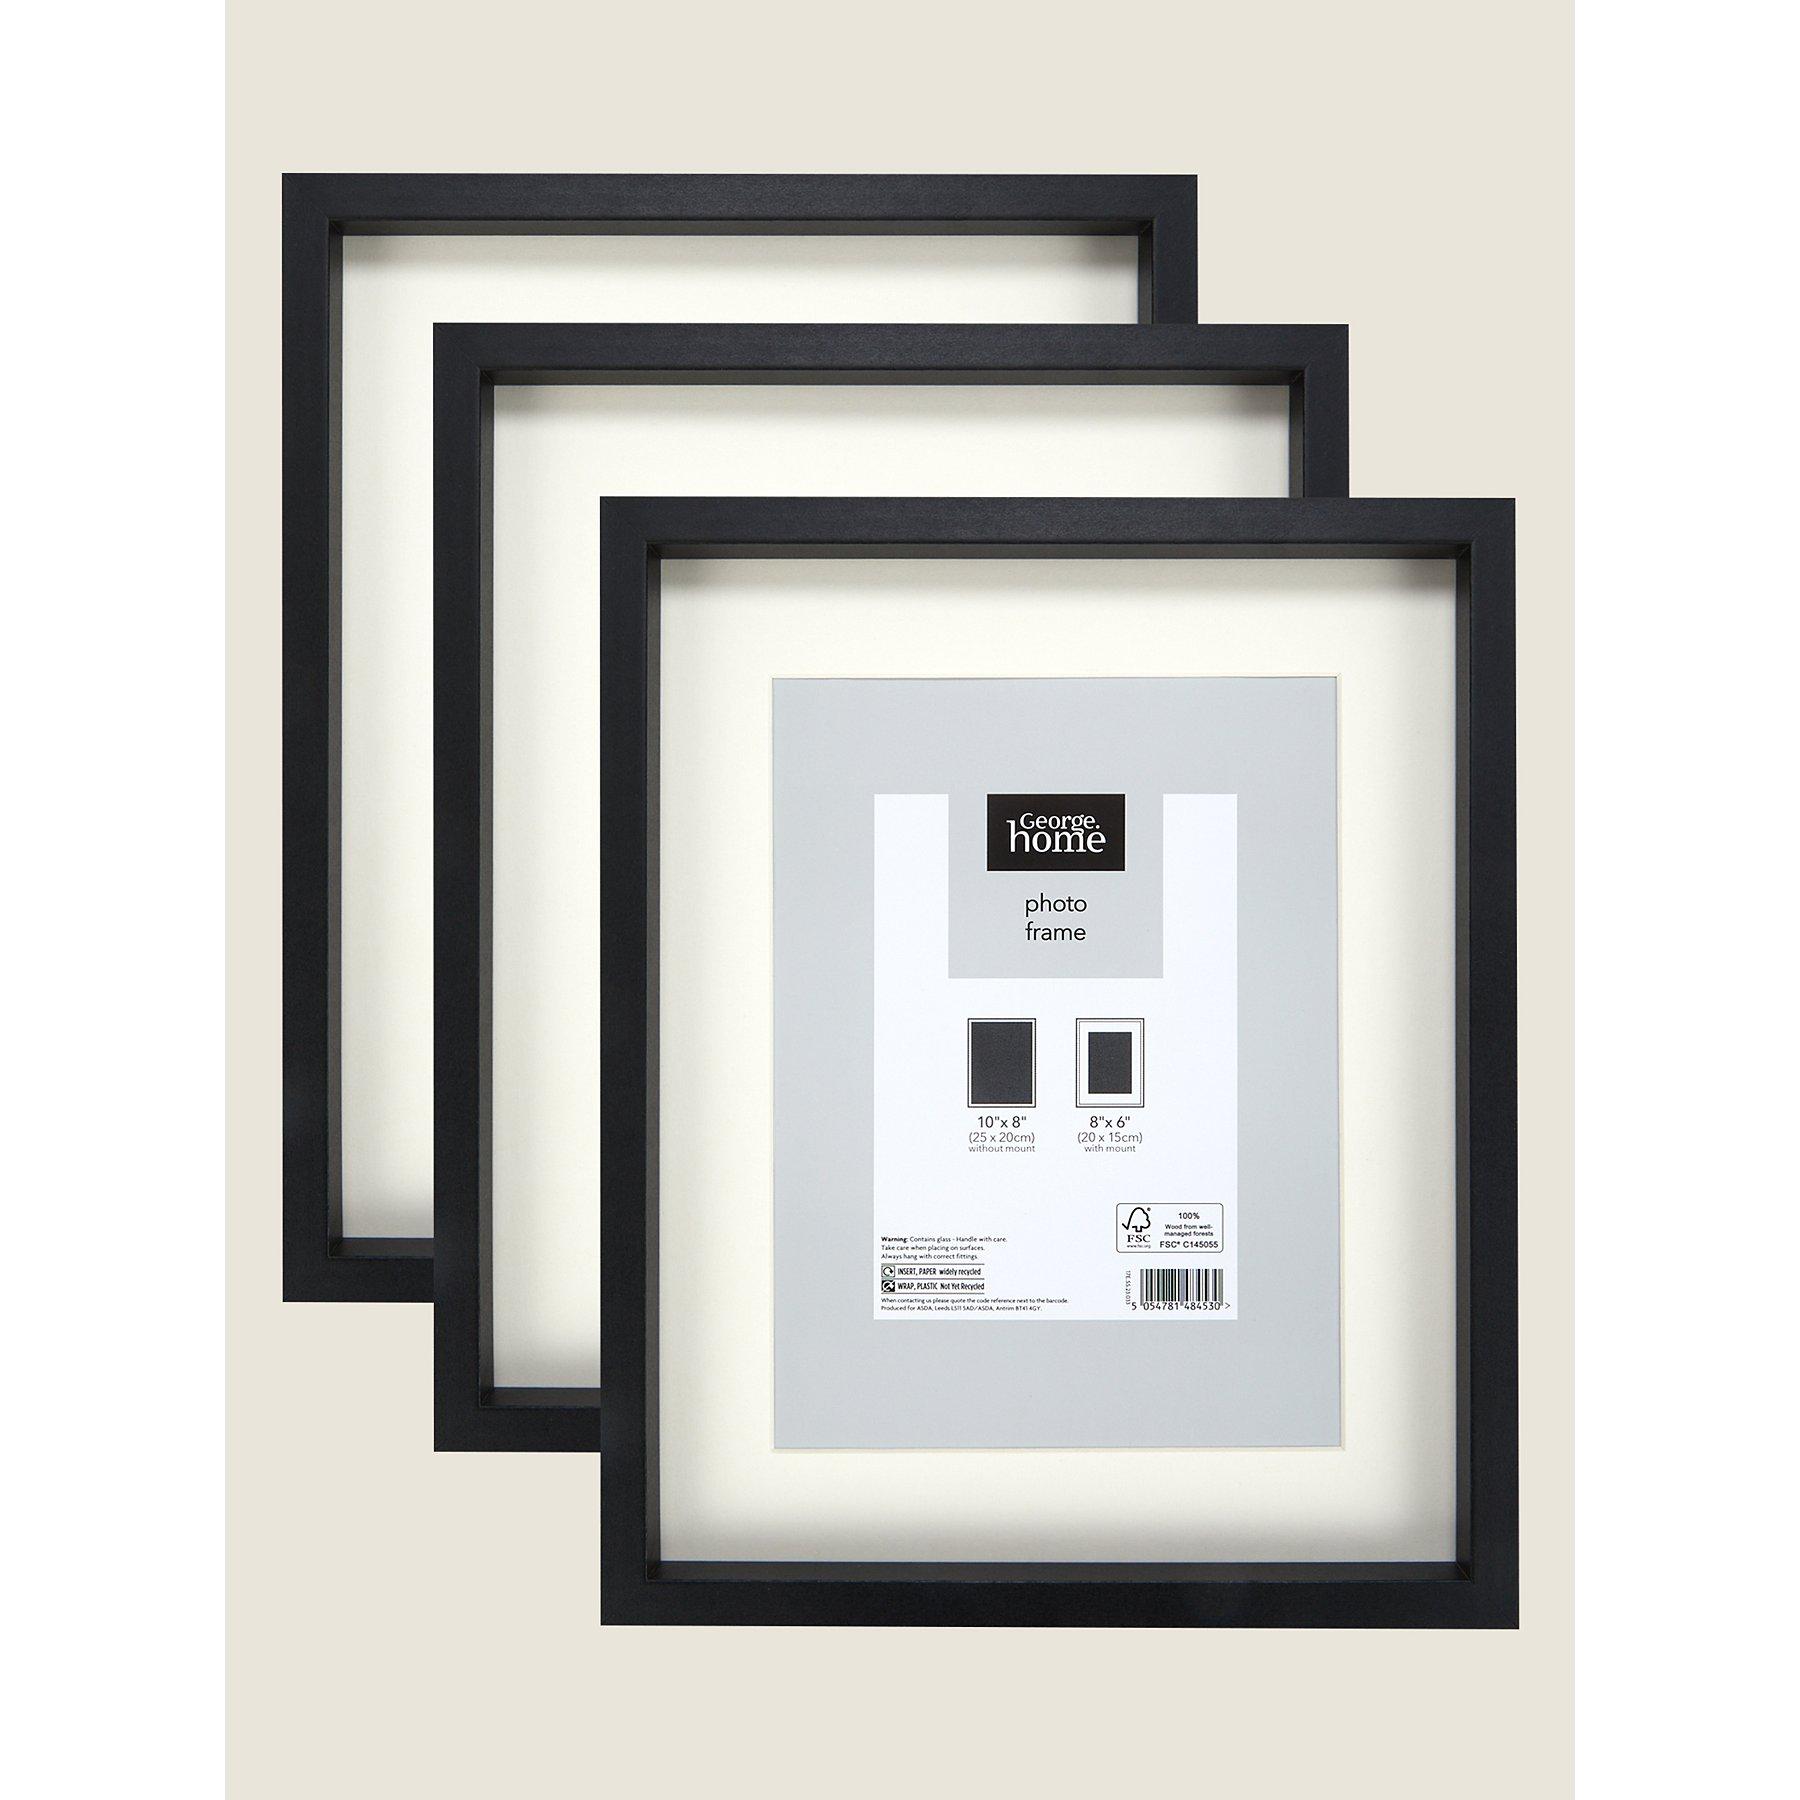 Black Boxed Photo Frame 8x6 Inch 3 Pack George